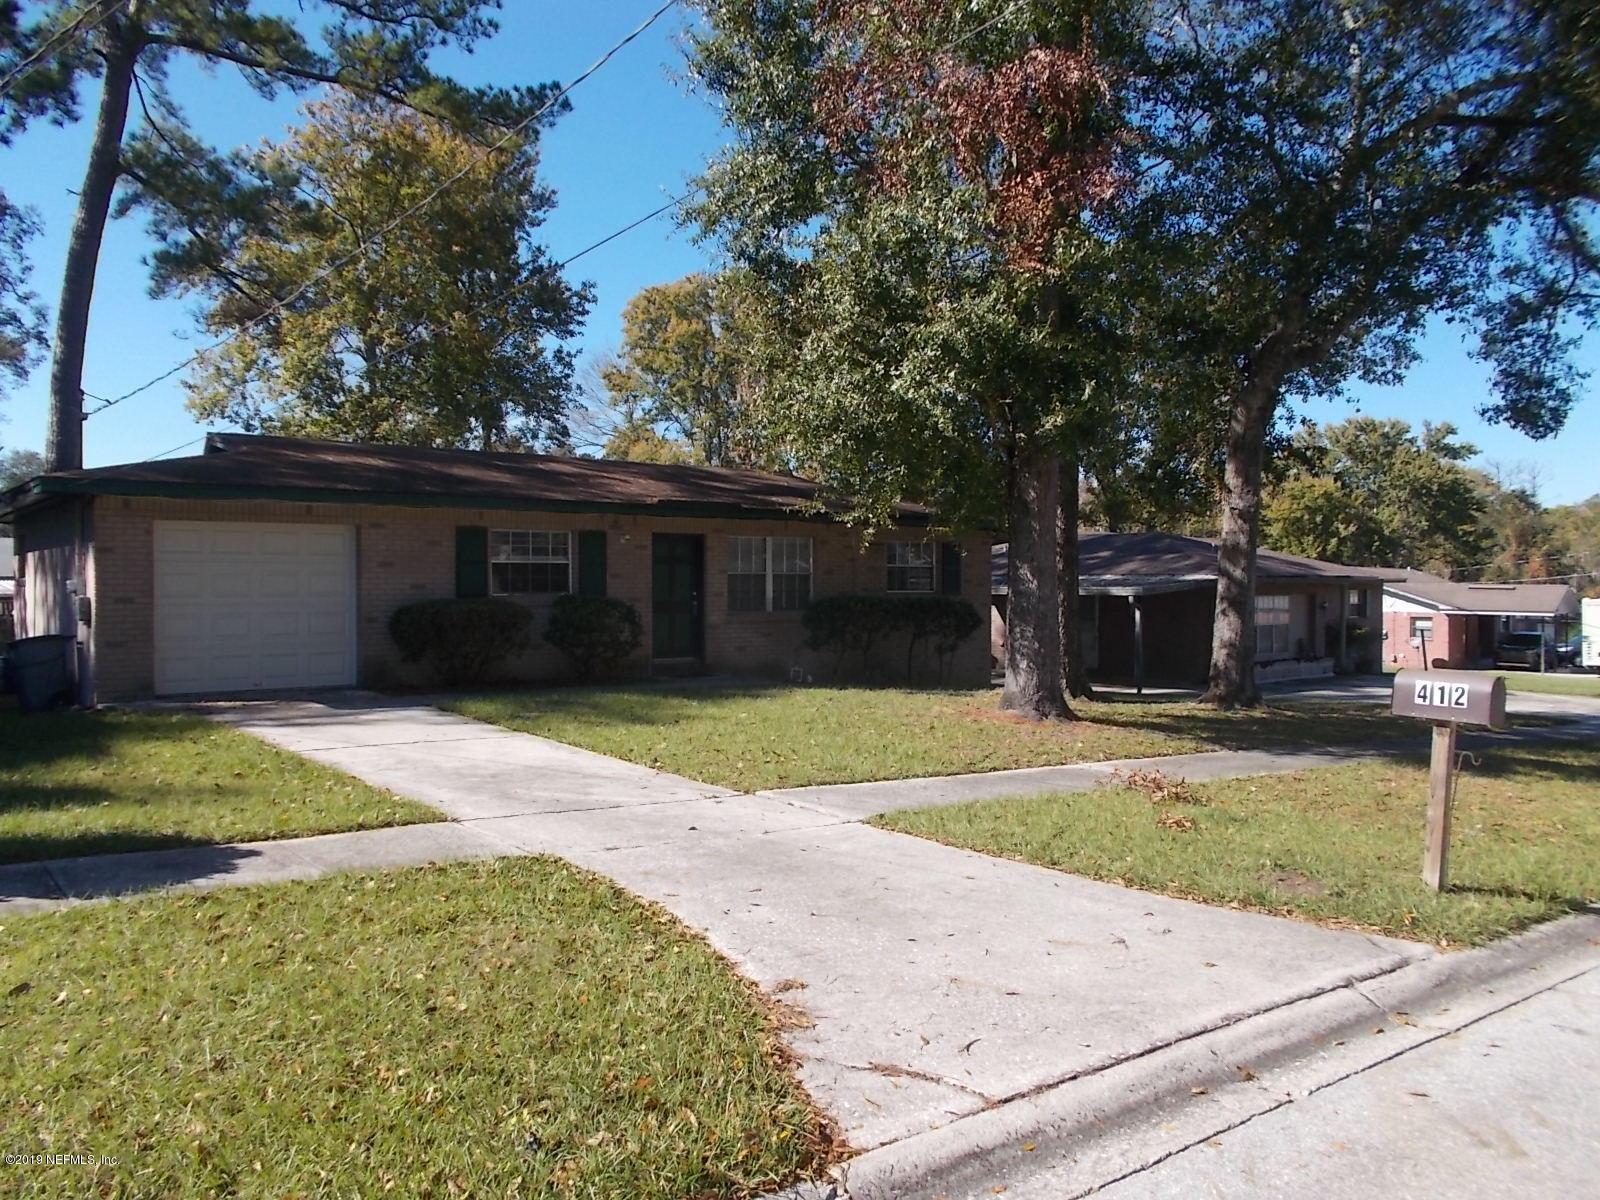 412 CAPRICORN, ORANGE PARK, FLORIDA 32073, 3 Bedrooms Bedrooms, ,1 BathroomBathrooms,Rental,For sale,CAPRICORN,1026516